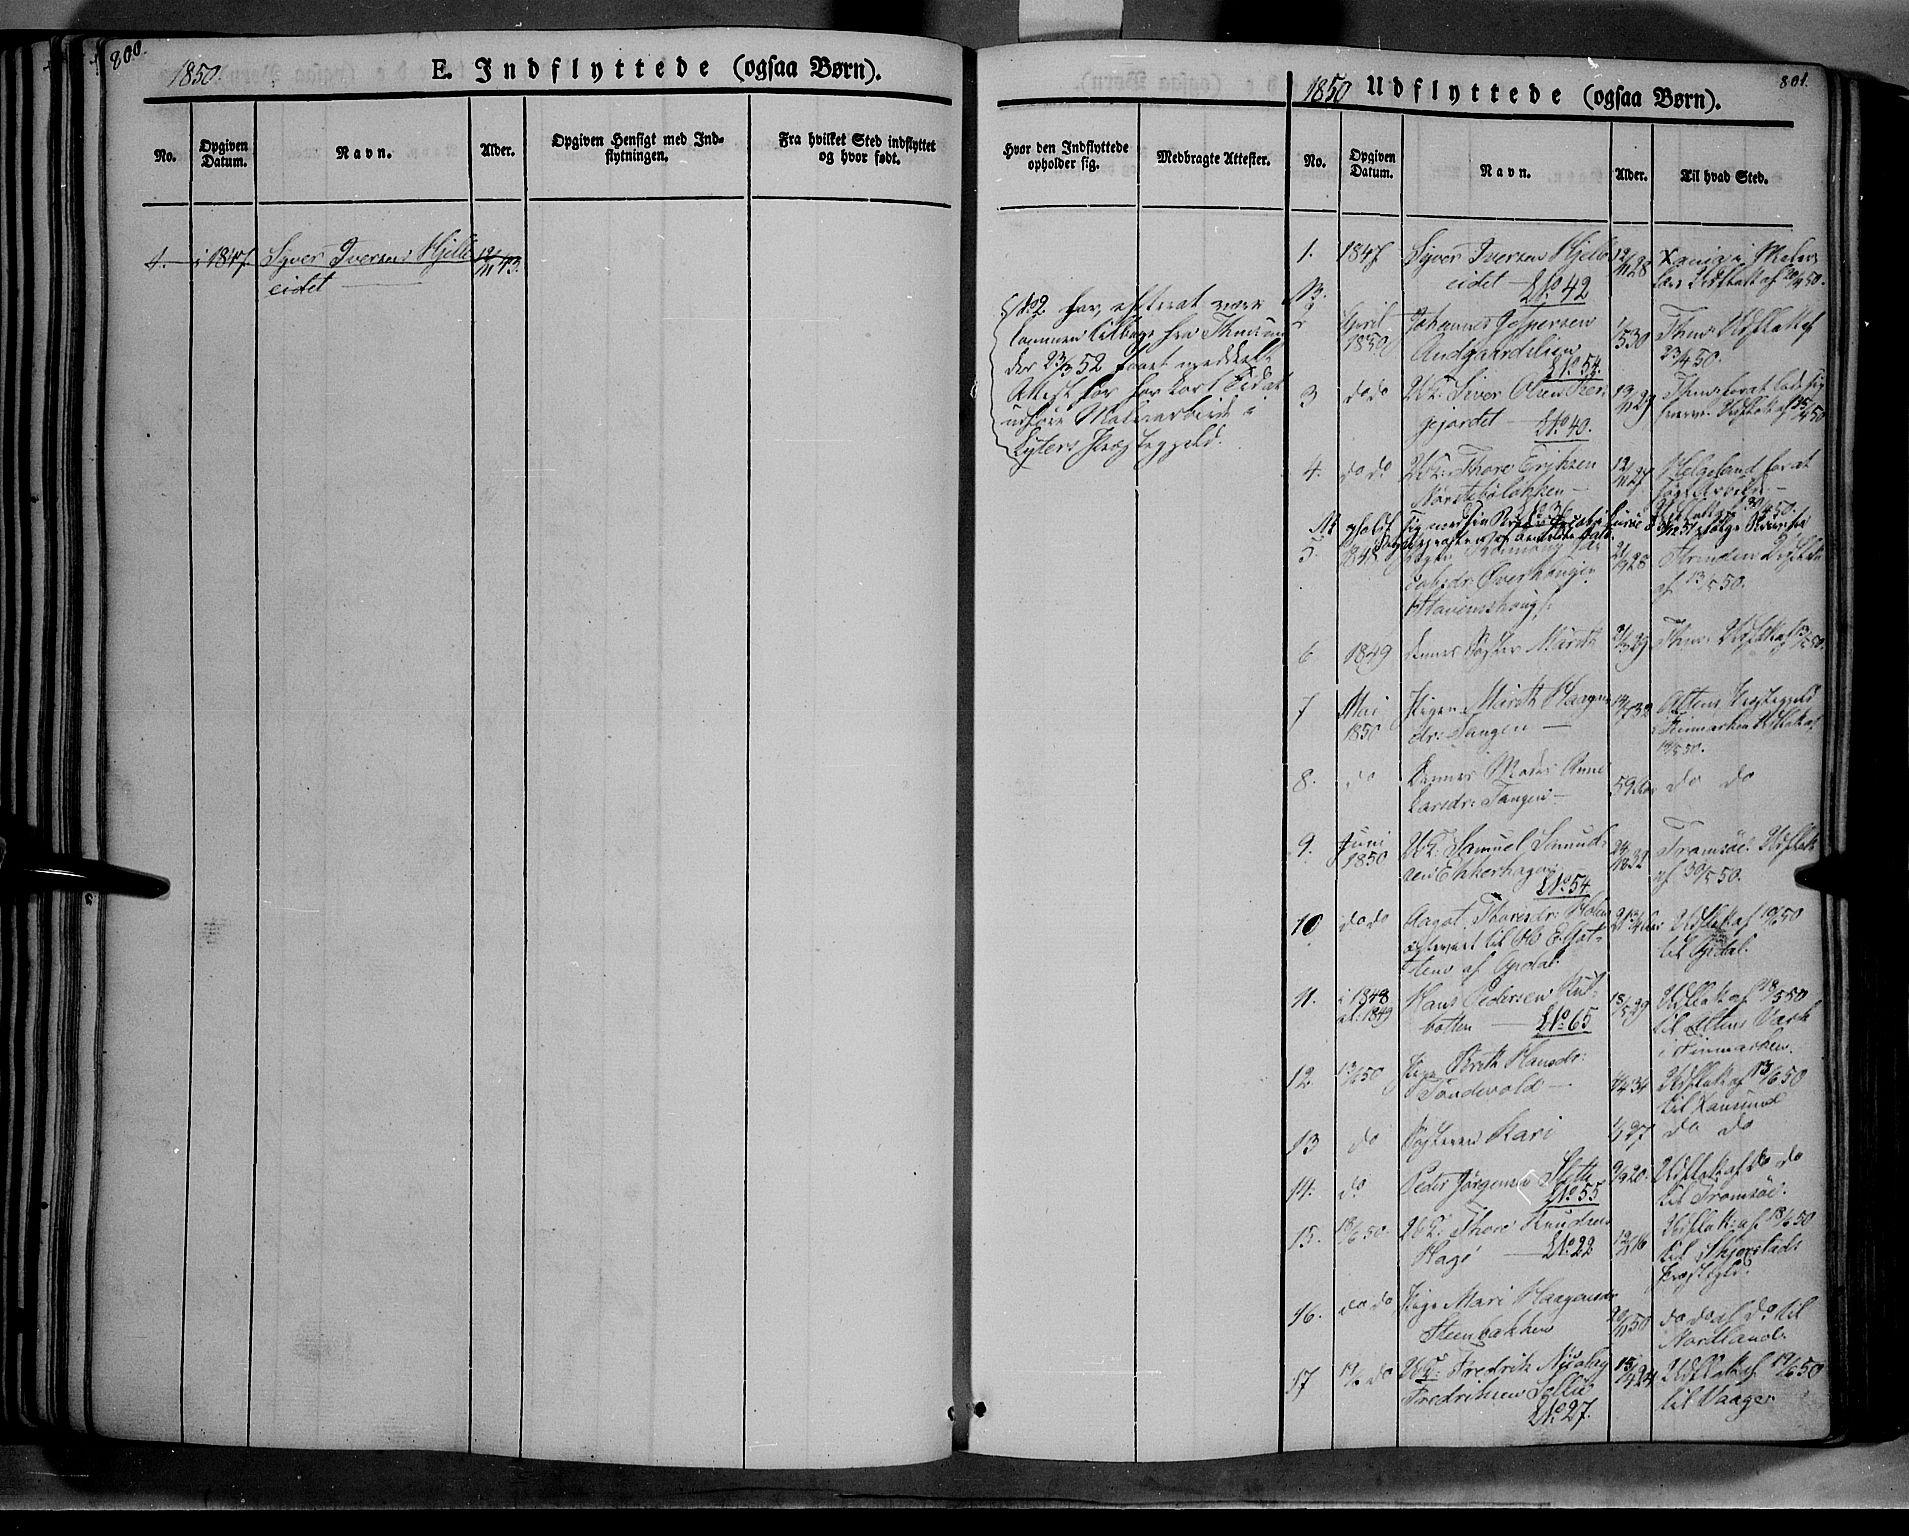 SAH, Lesja prestekontor, Ministerialbok nr. 6B, 1843-1854, s. 800-801